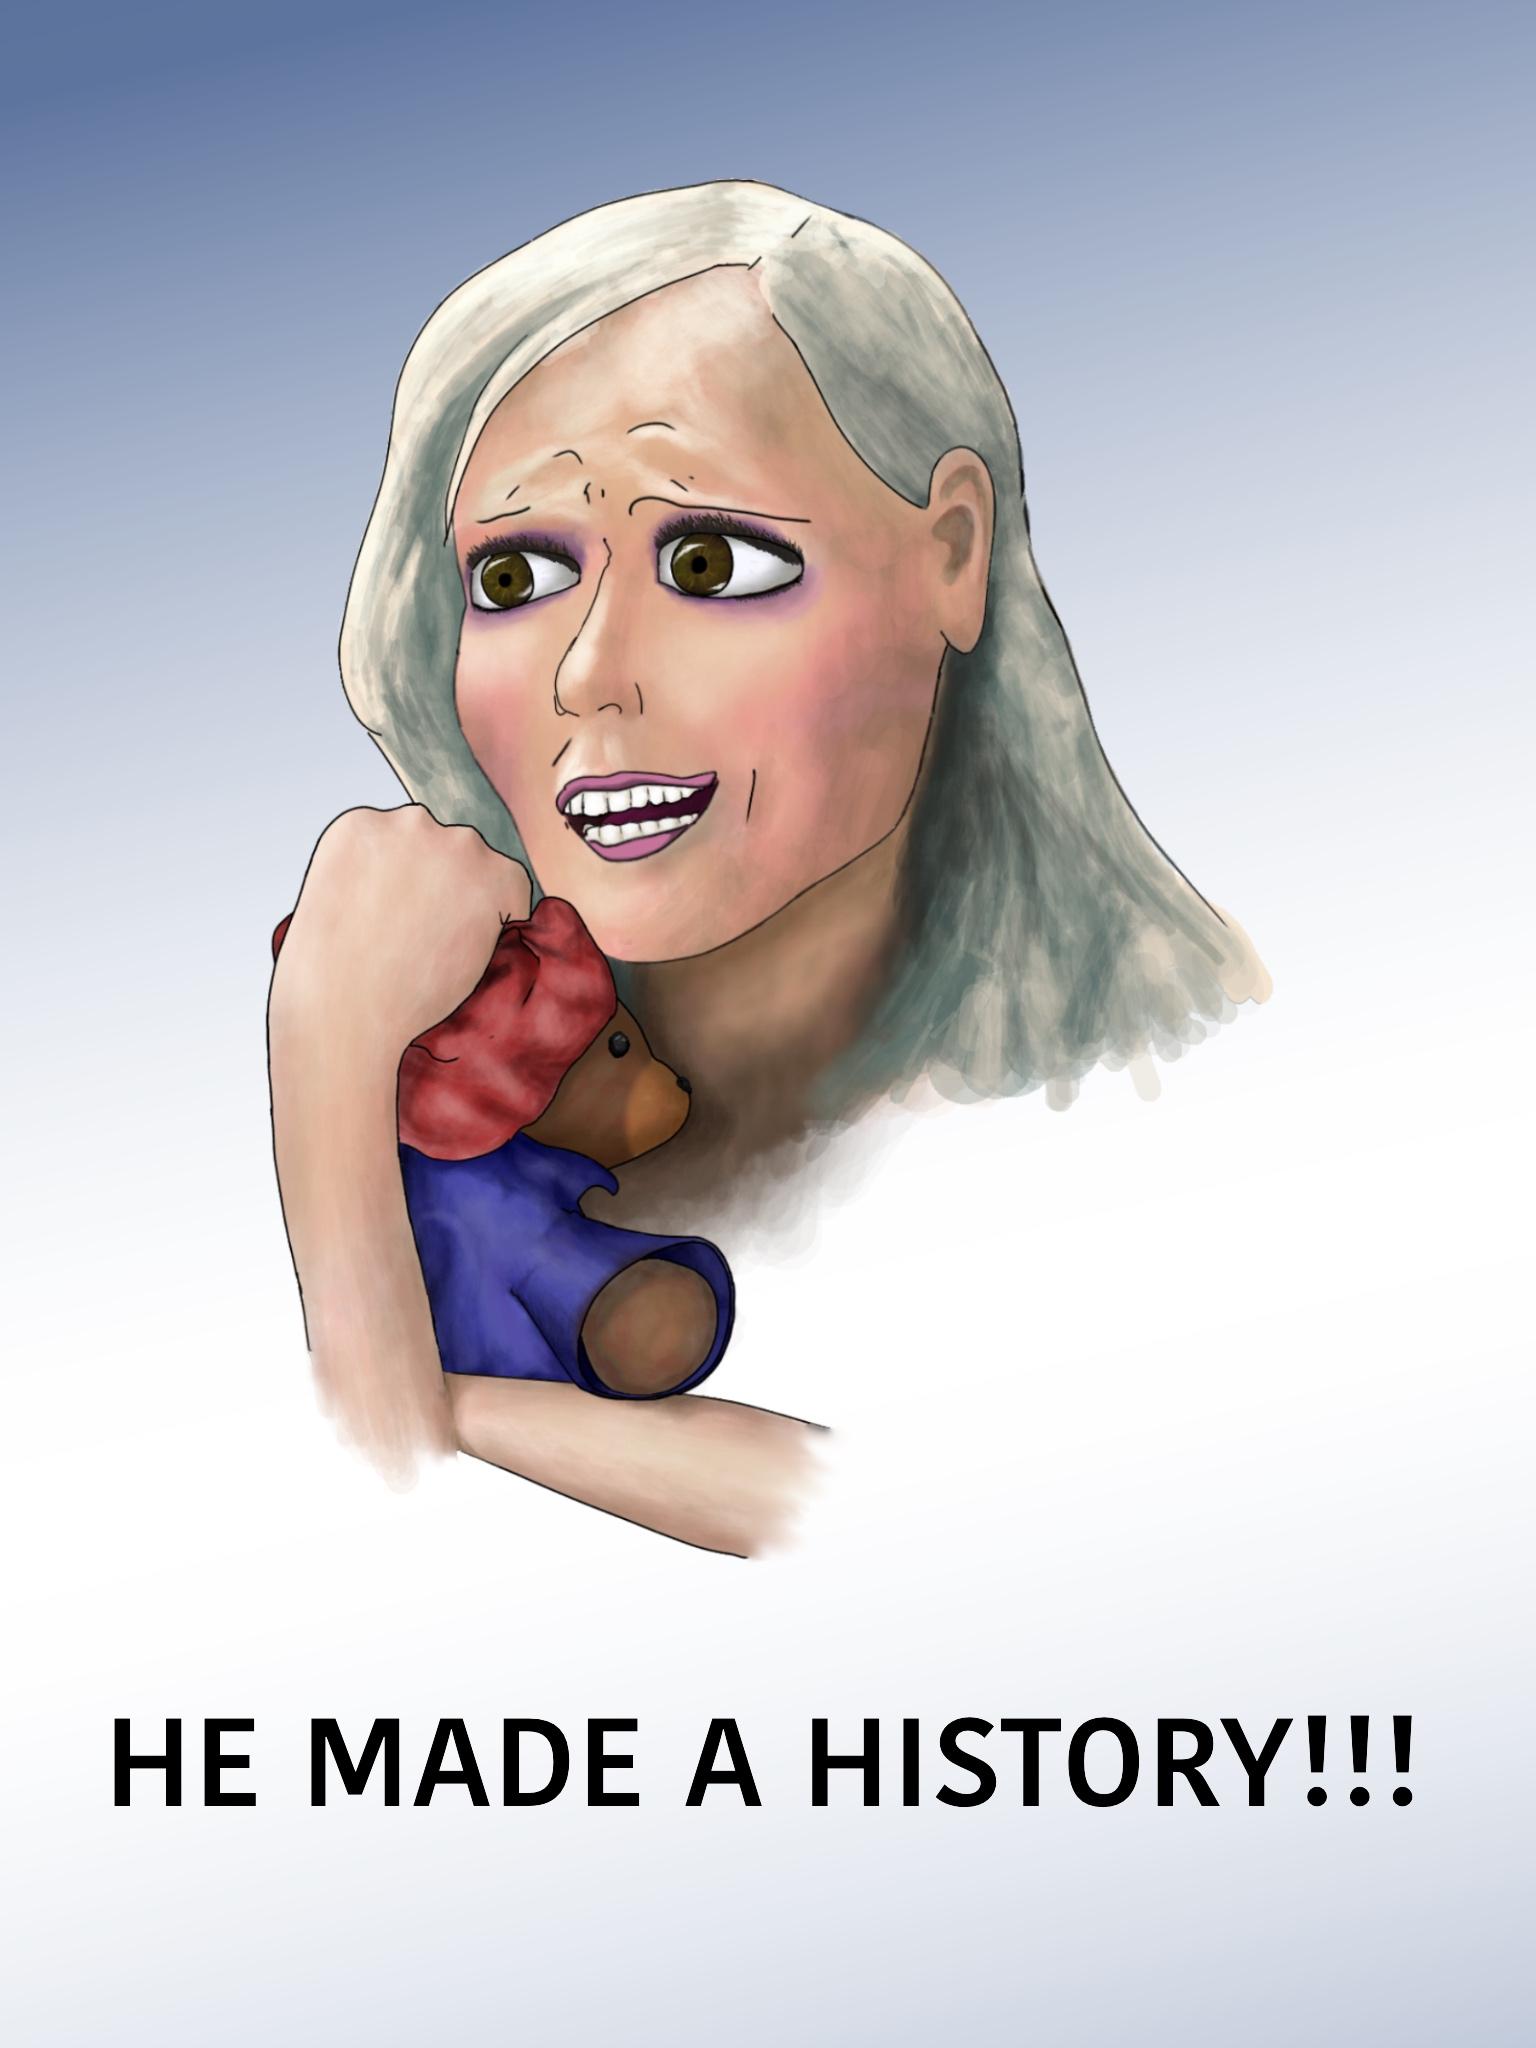 HE MADE A HISTORY!!!